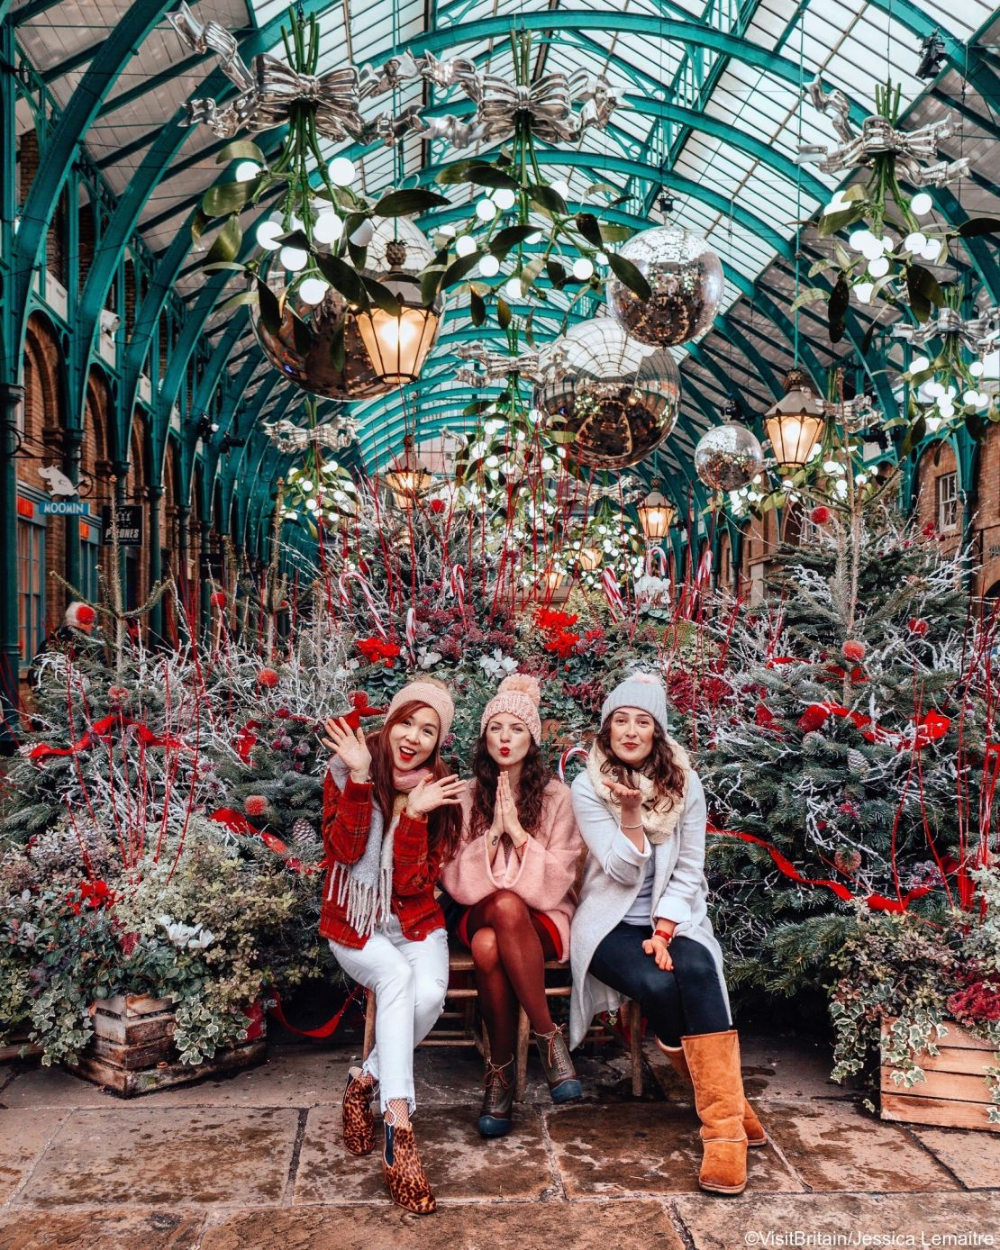 10 brilliant British winter holiday ideas London